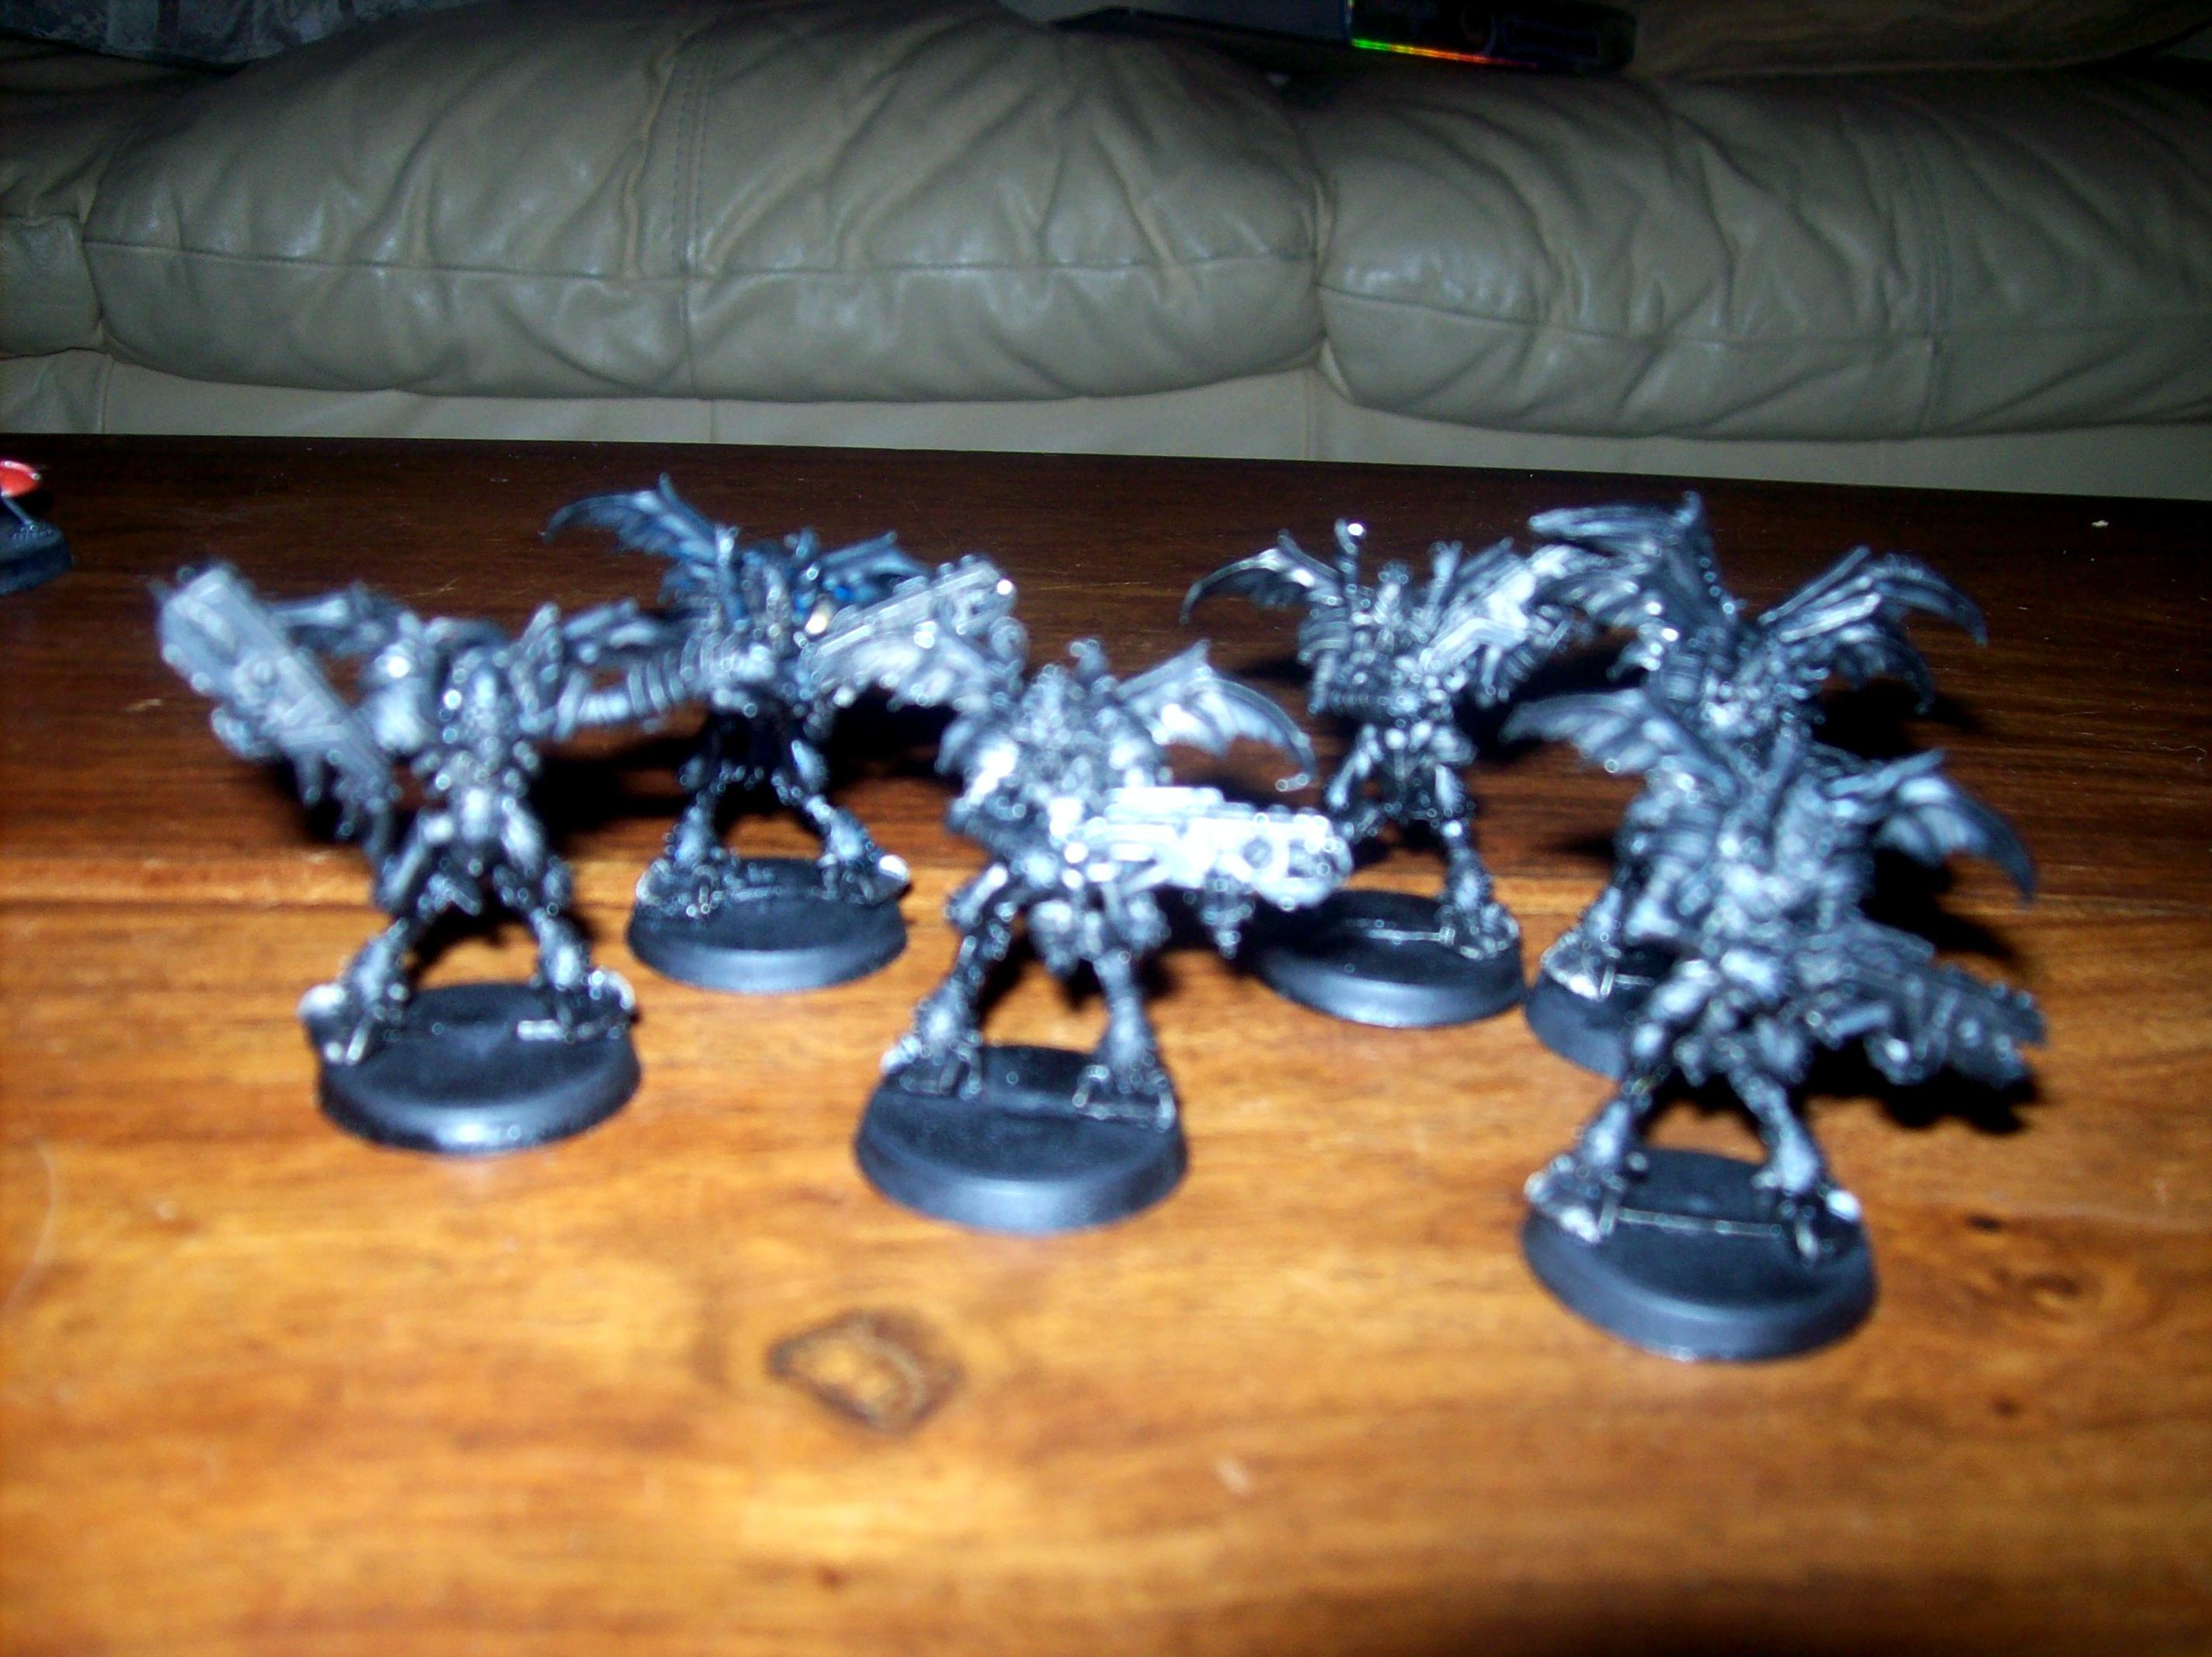 Blurred Photo, Tau, Unit, Warhammer 40,000, Work In Progress